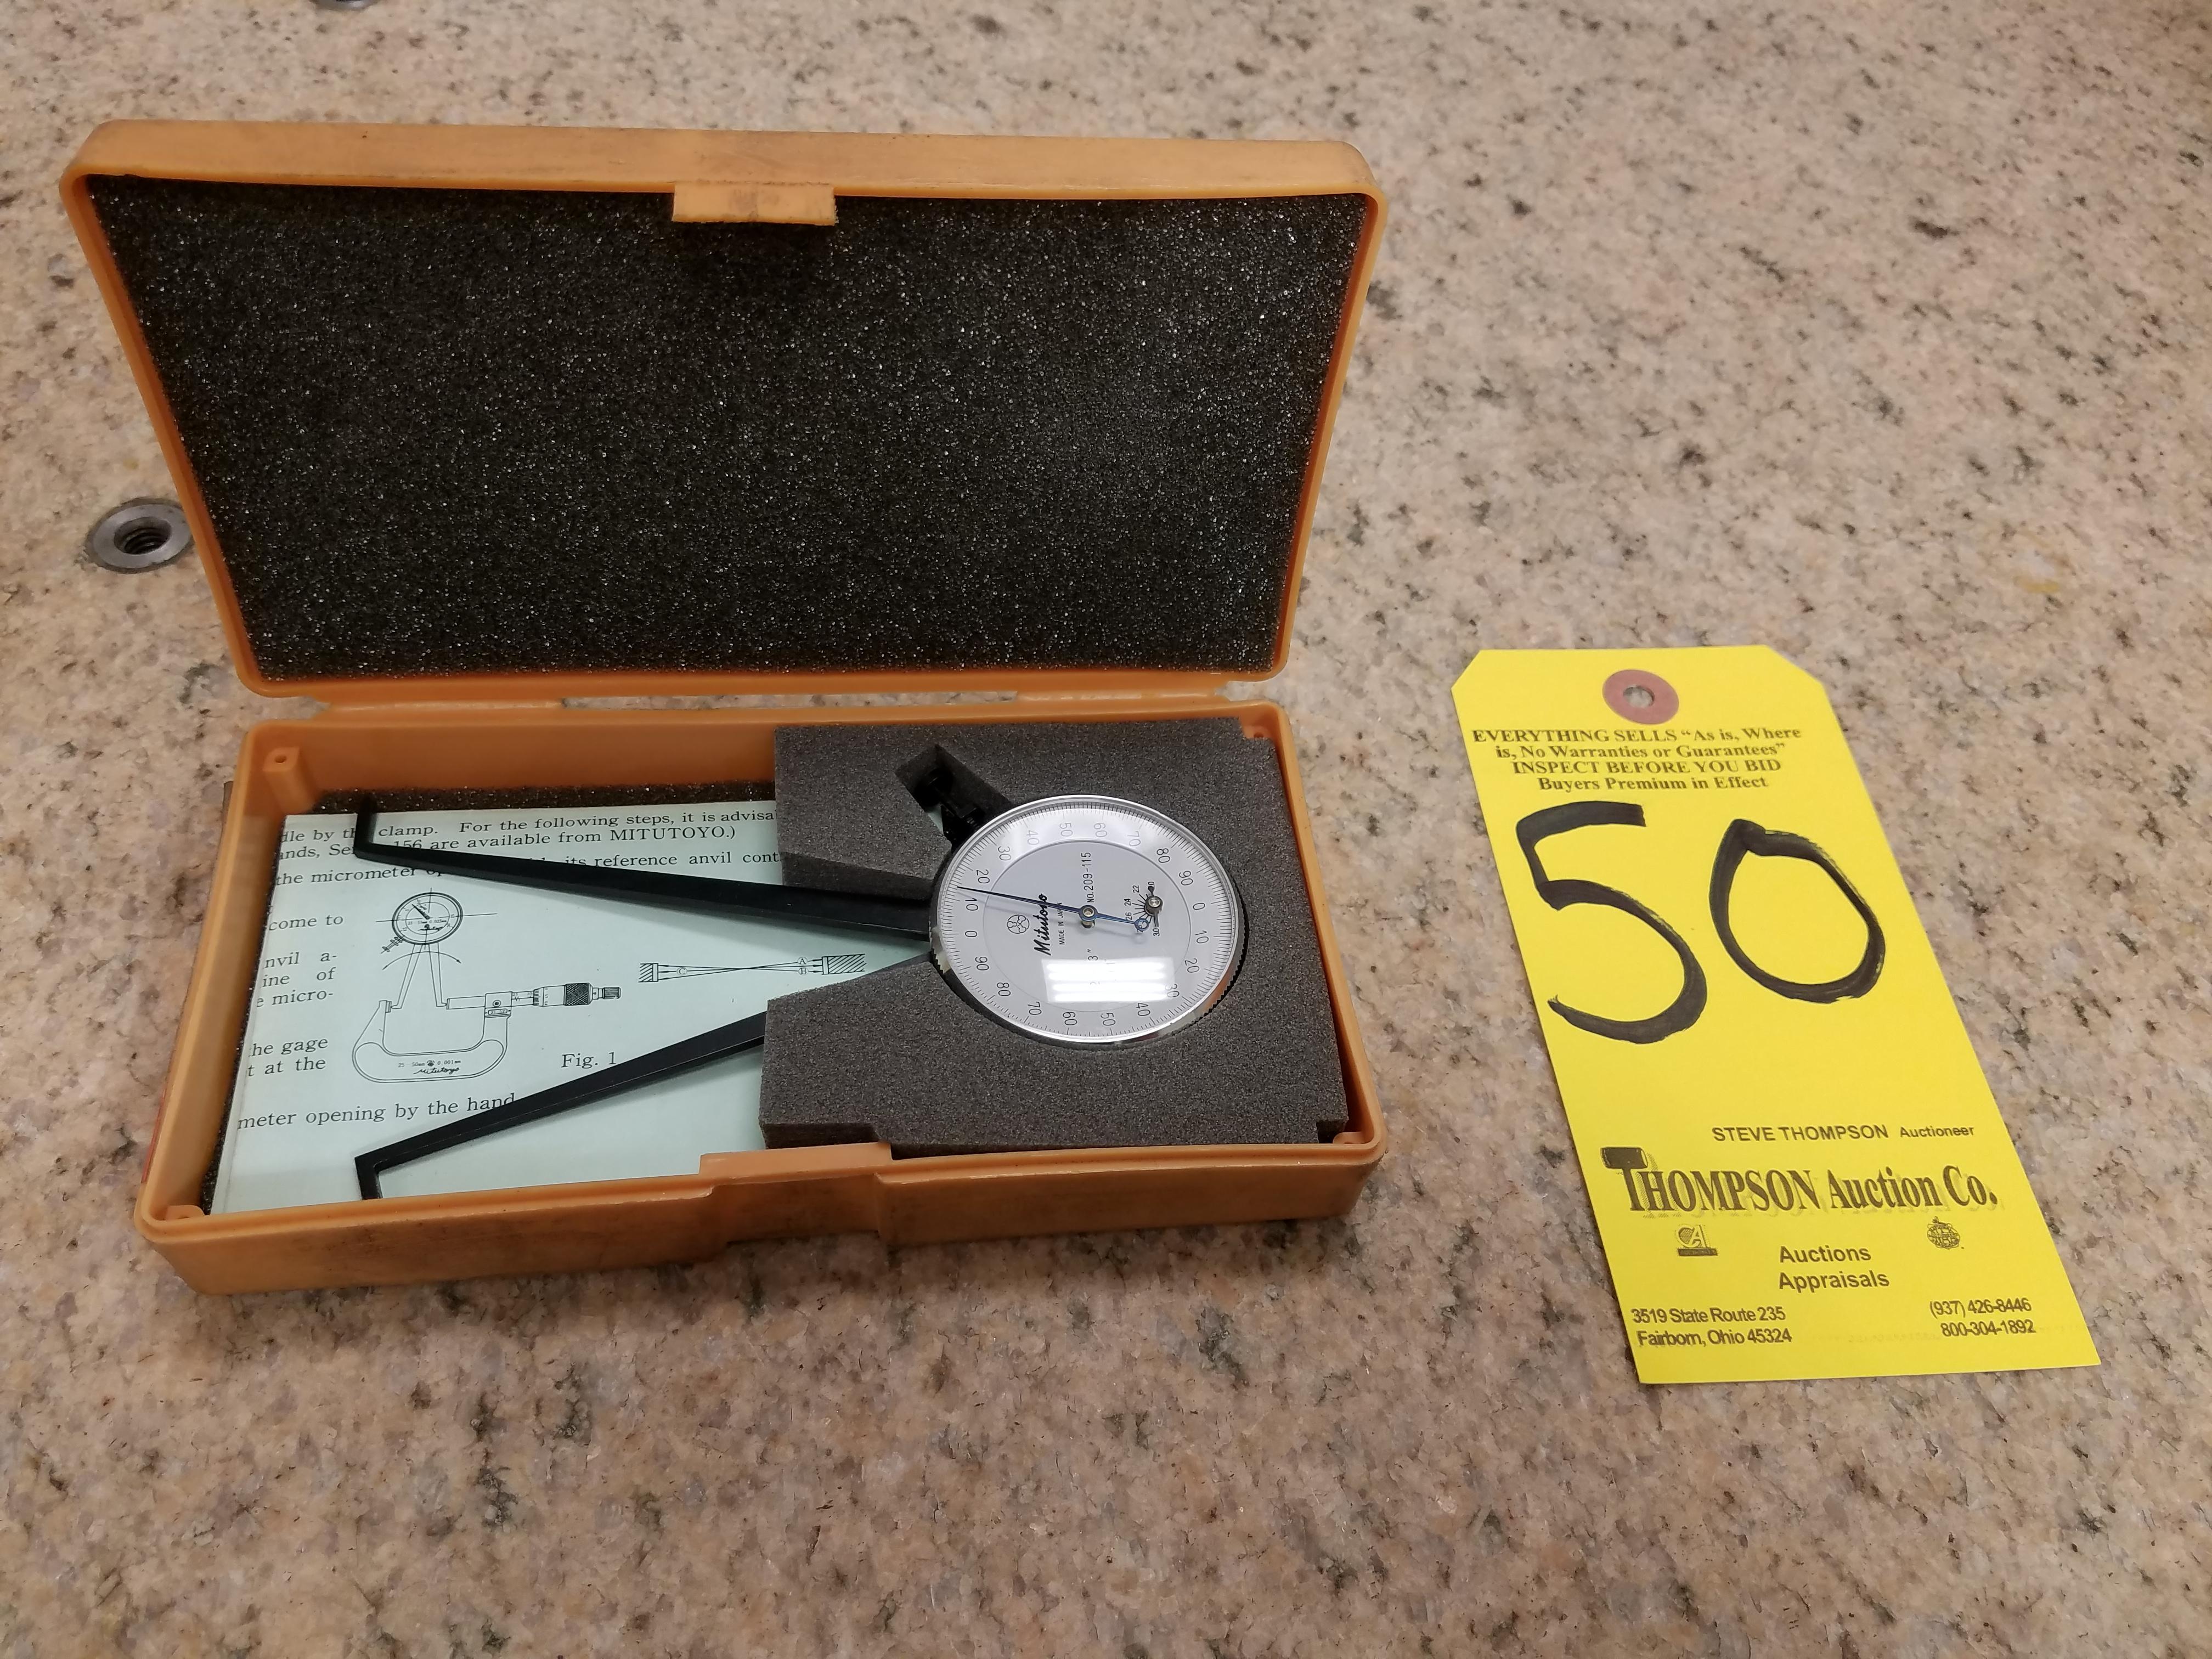 Lot 50 - Mitutoyo Dial Caliper Internal Type Gage